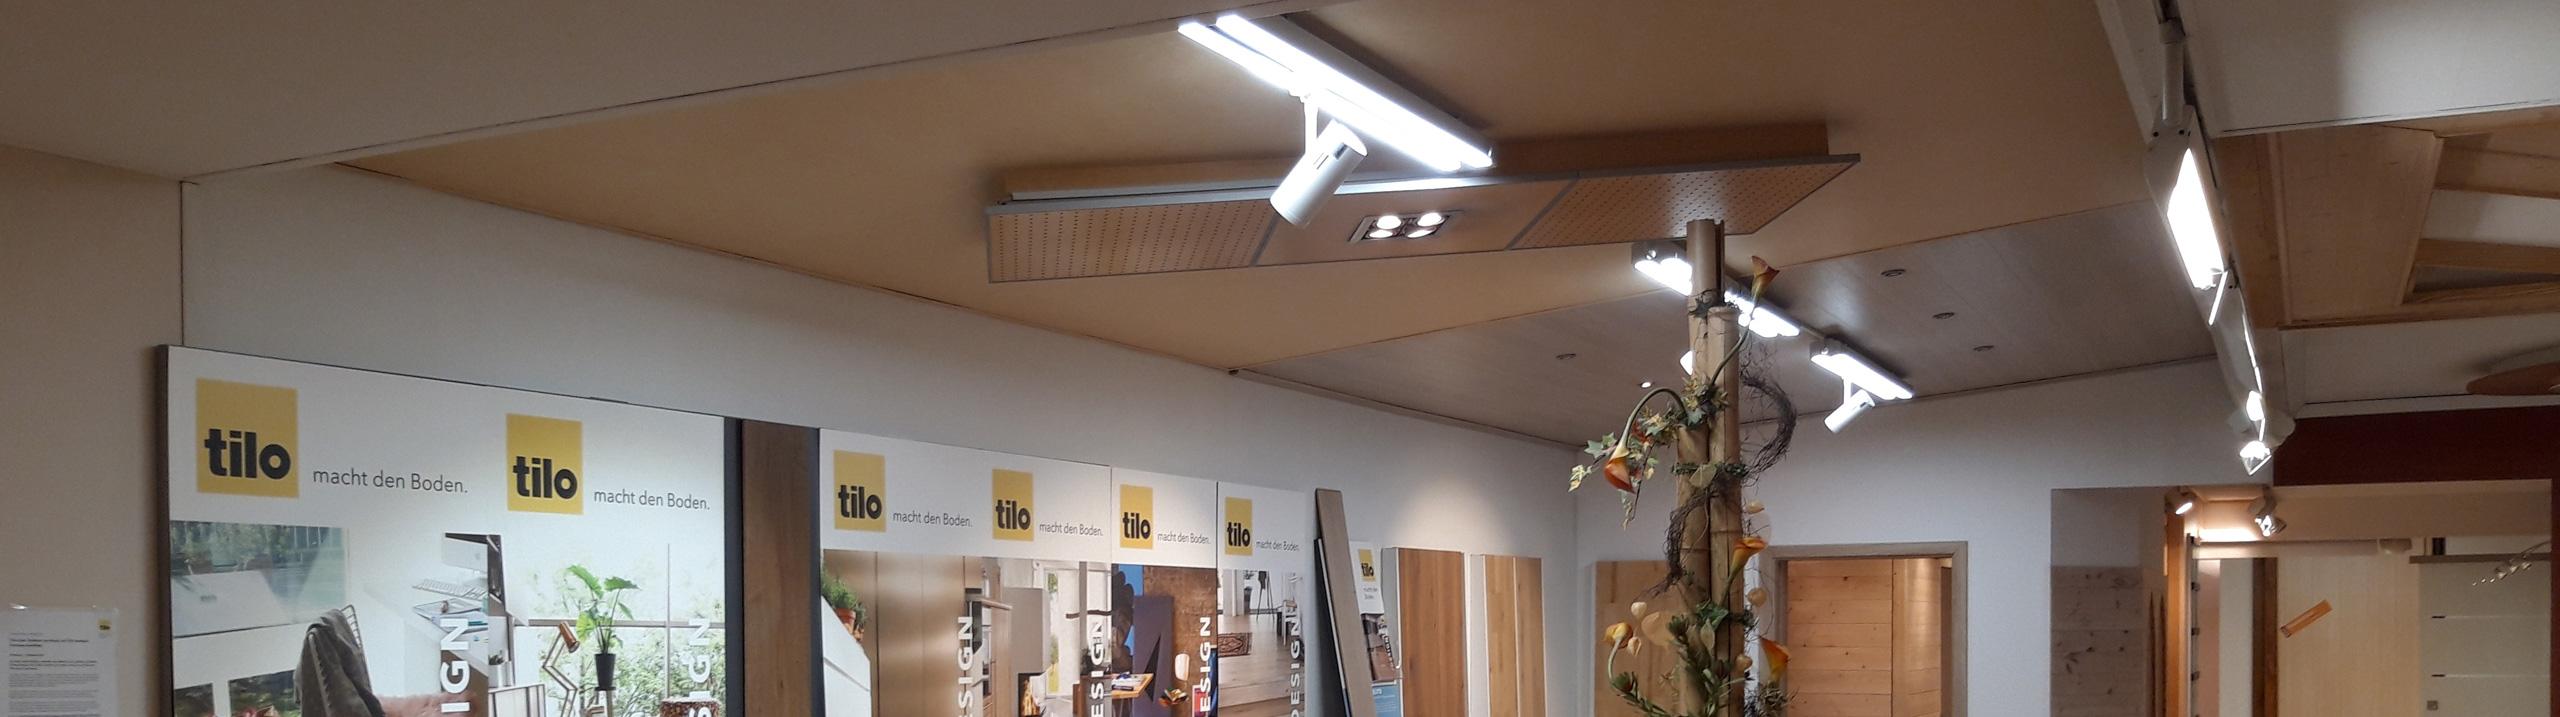 Verkaufsräume Beleuchtung protec ENERGYPLUS GmbH